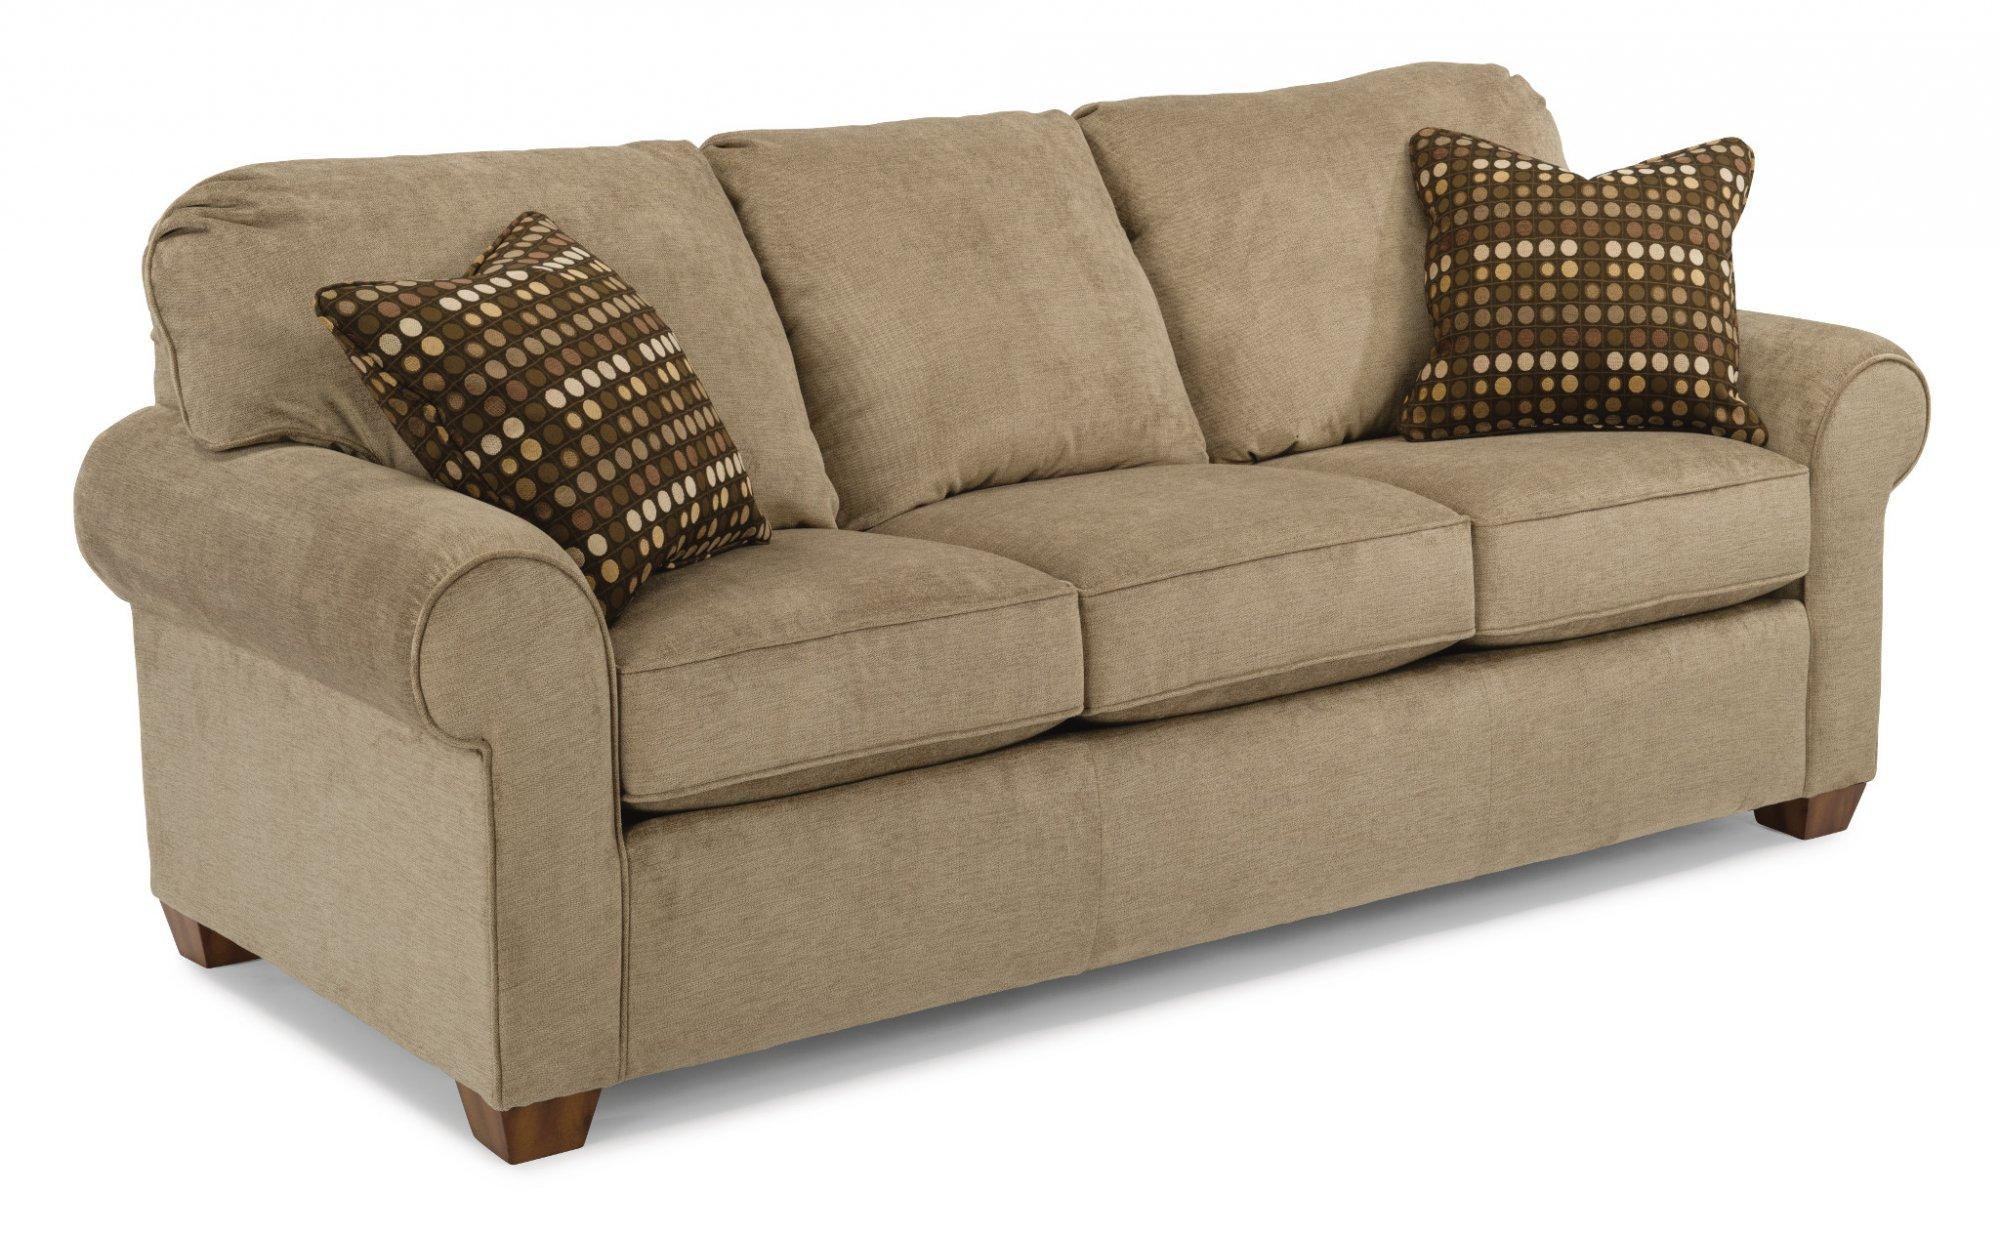 Phenomenal Flexsteel 5535 31 Thornton Fabric Sofa Reese Warehouse Creativecarmelina Interior Chair Design Creativecarmelinacom